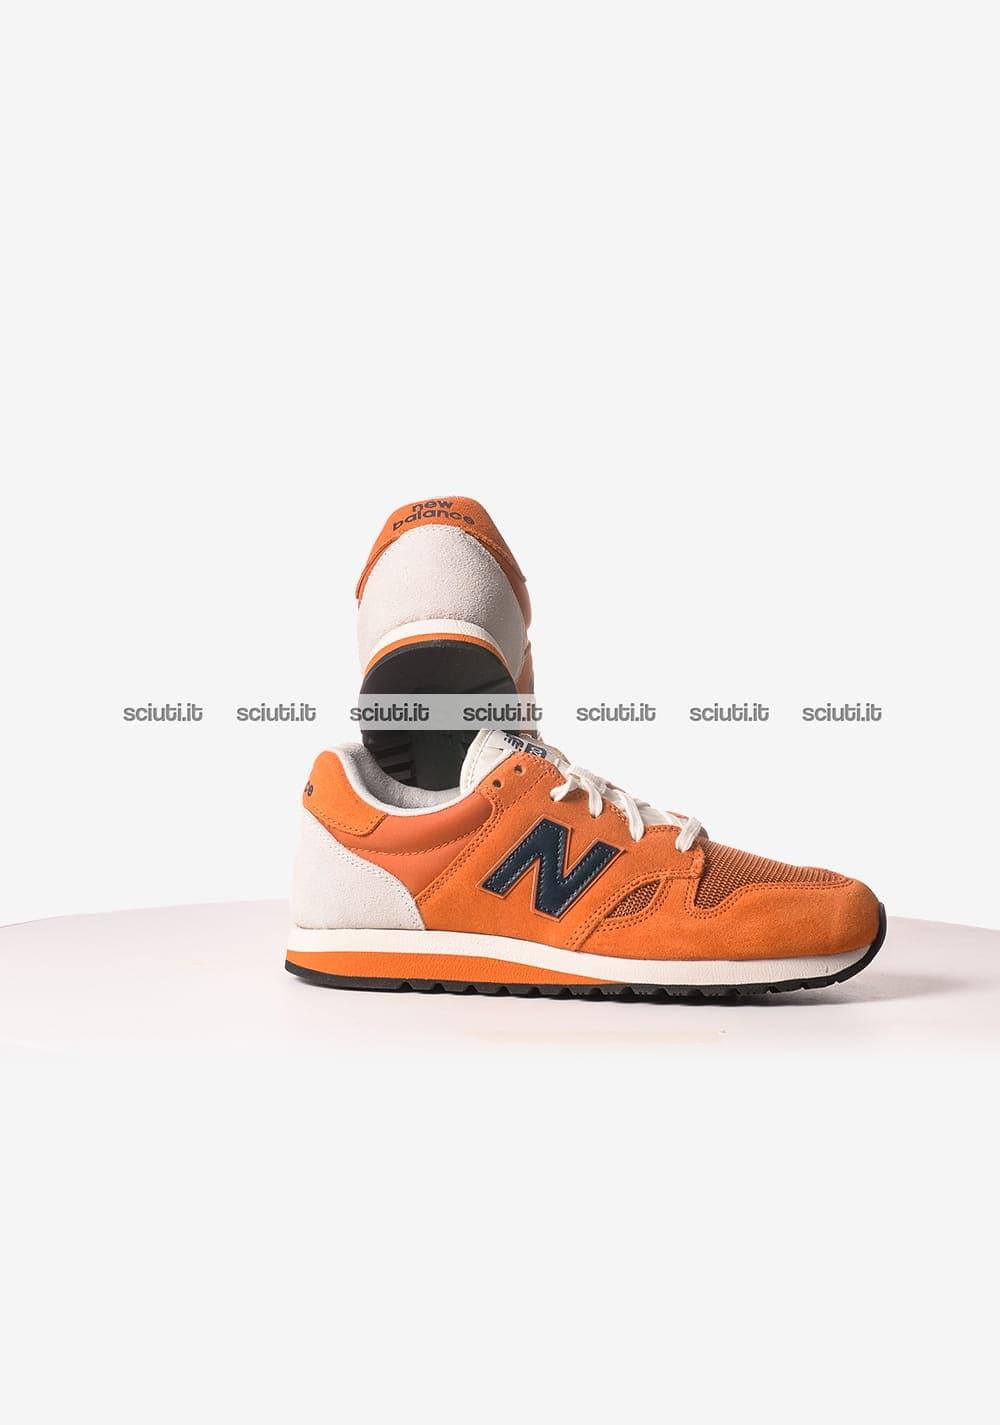 Scarpe New Balance uomo 520 arancio blu   Sciuti.it